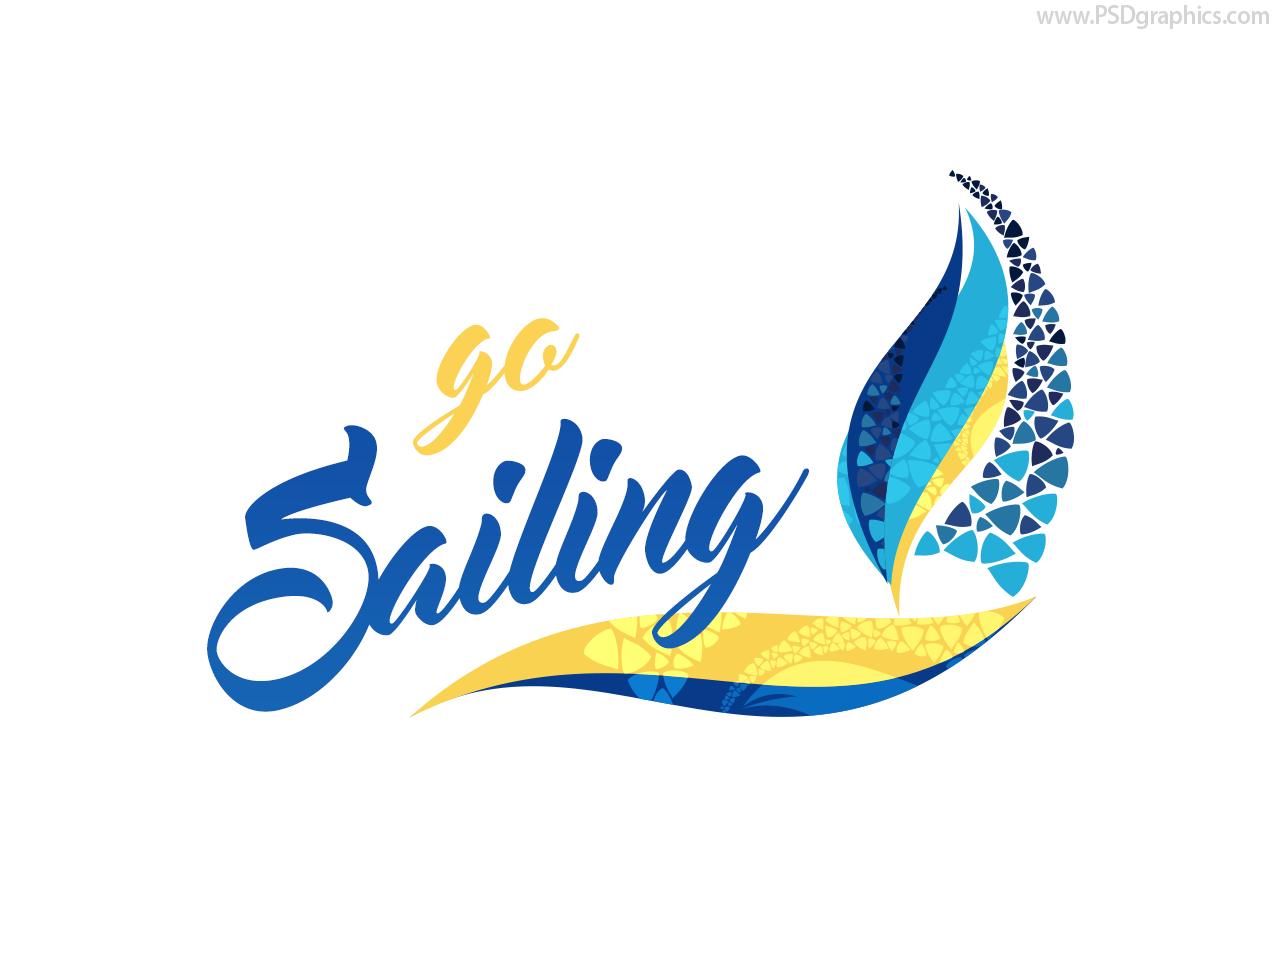 Sailing logo, PSD and AI templates.